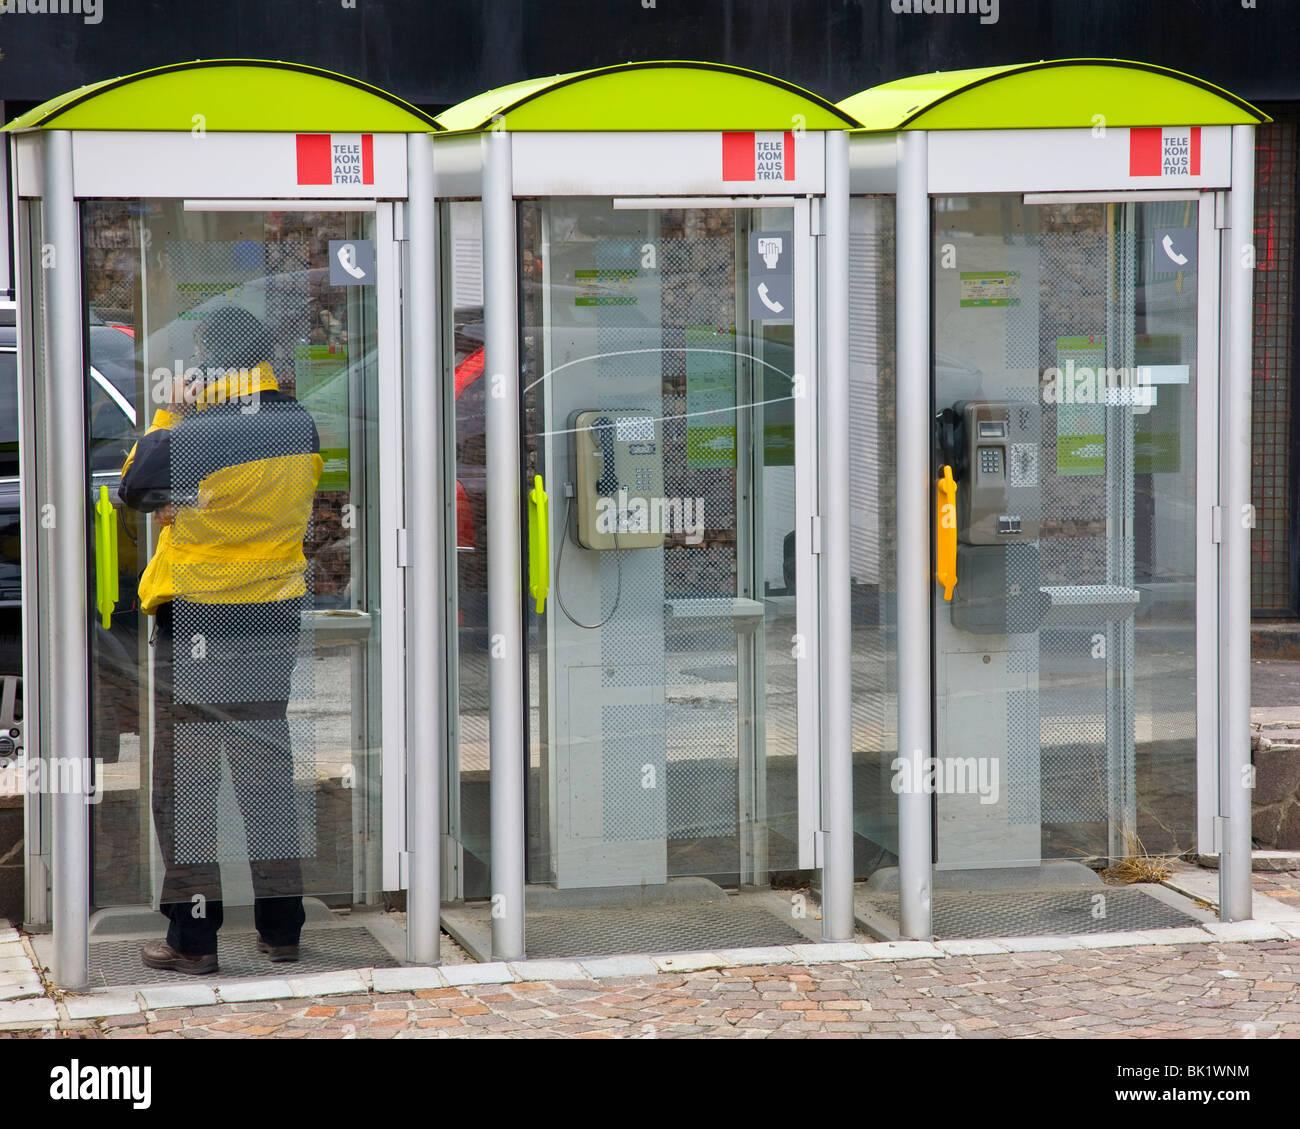 Three telephone kiosks - Stock Image